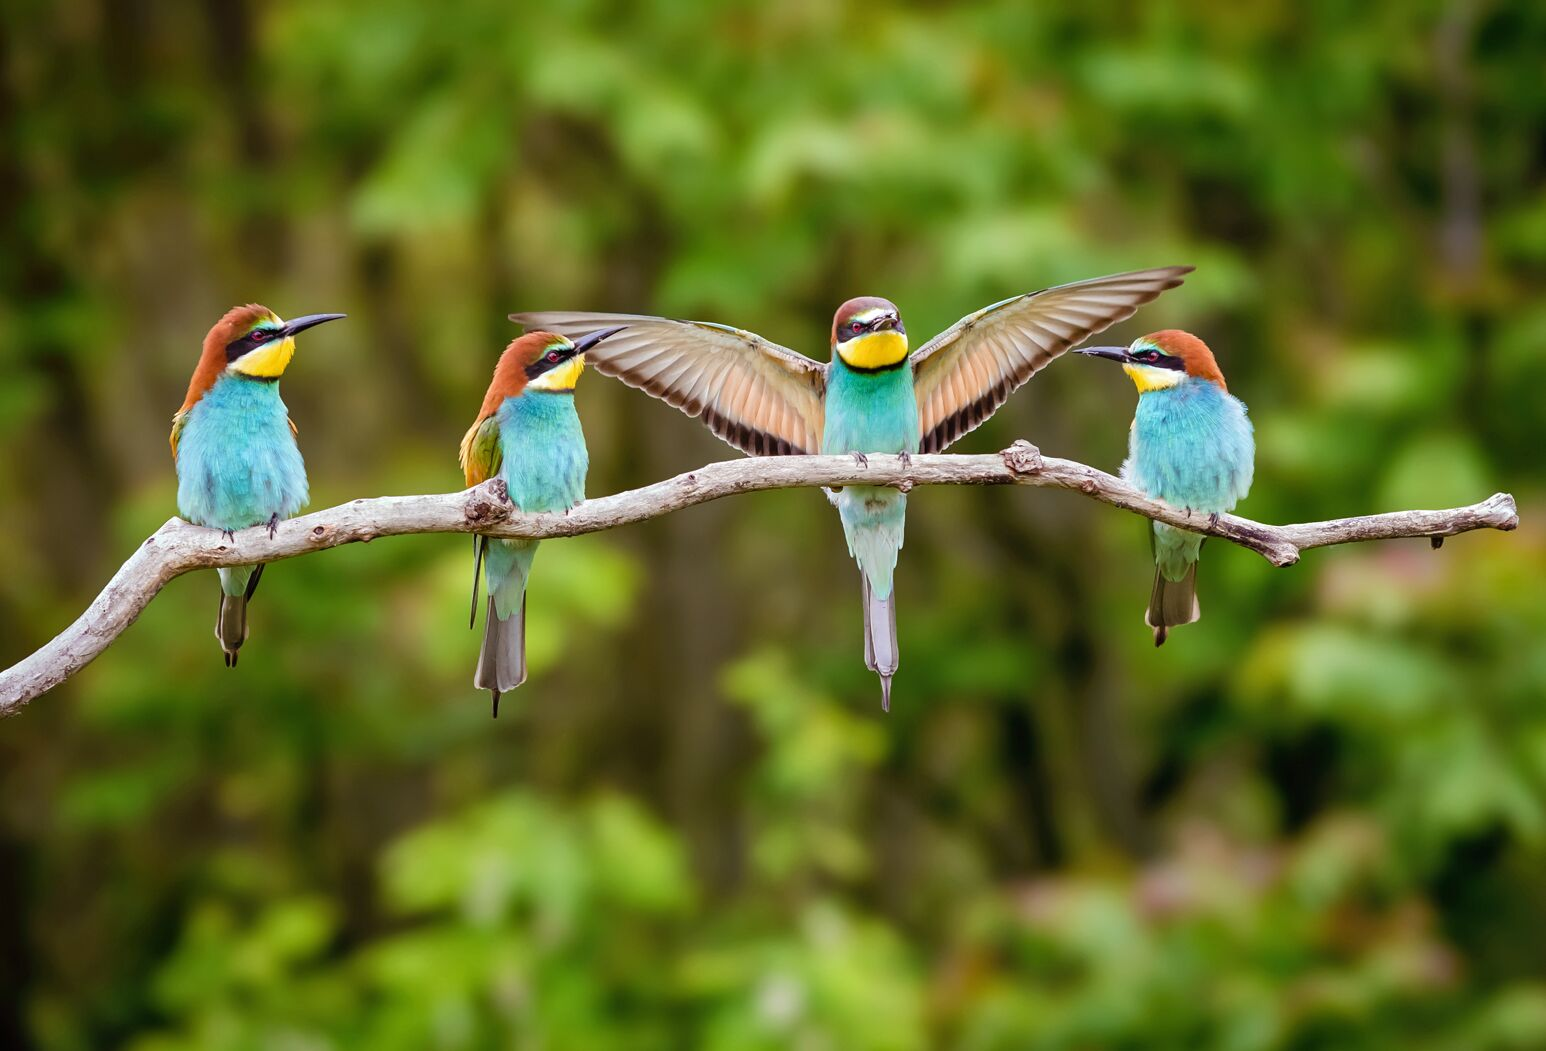 Birds on a tree branch